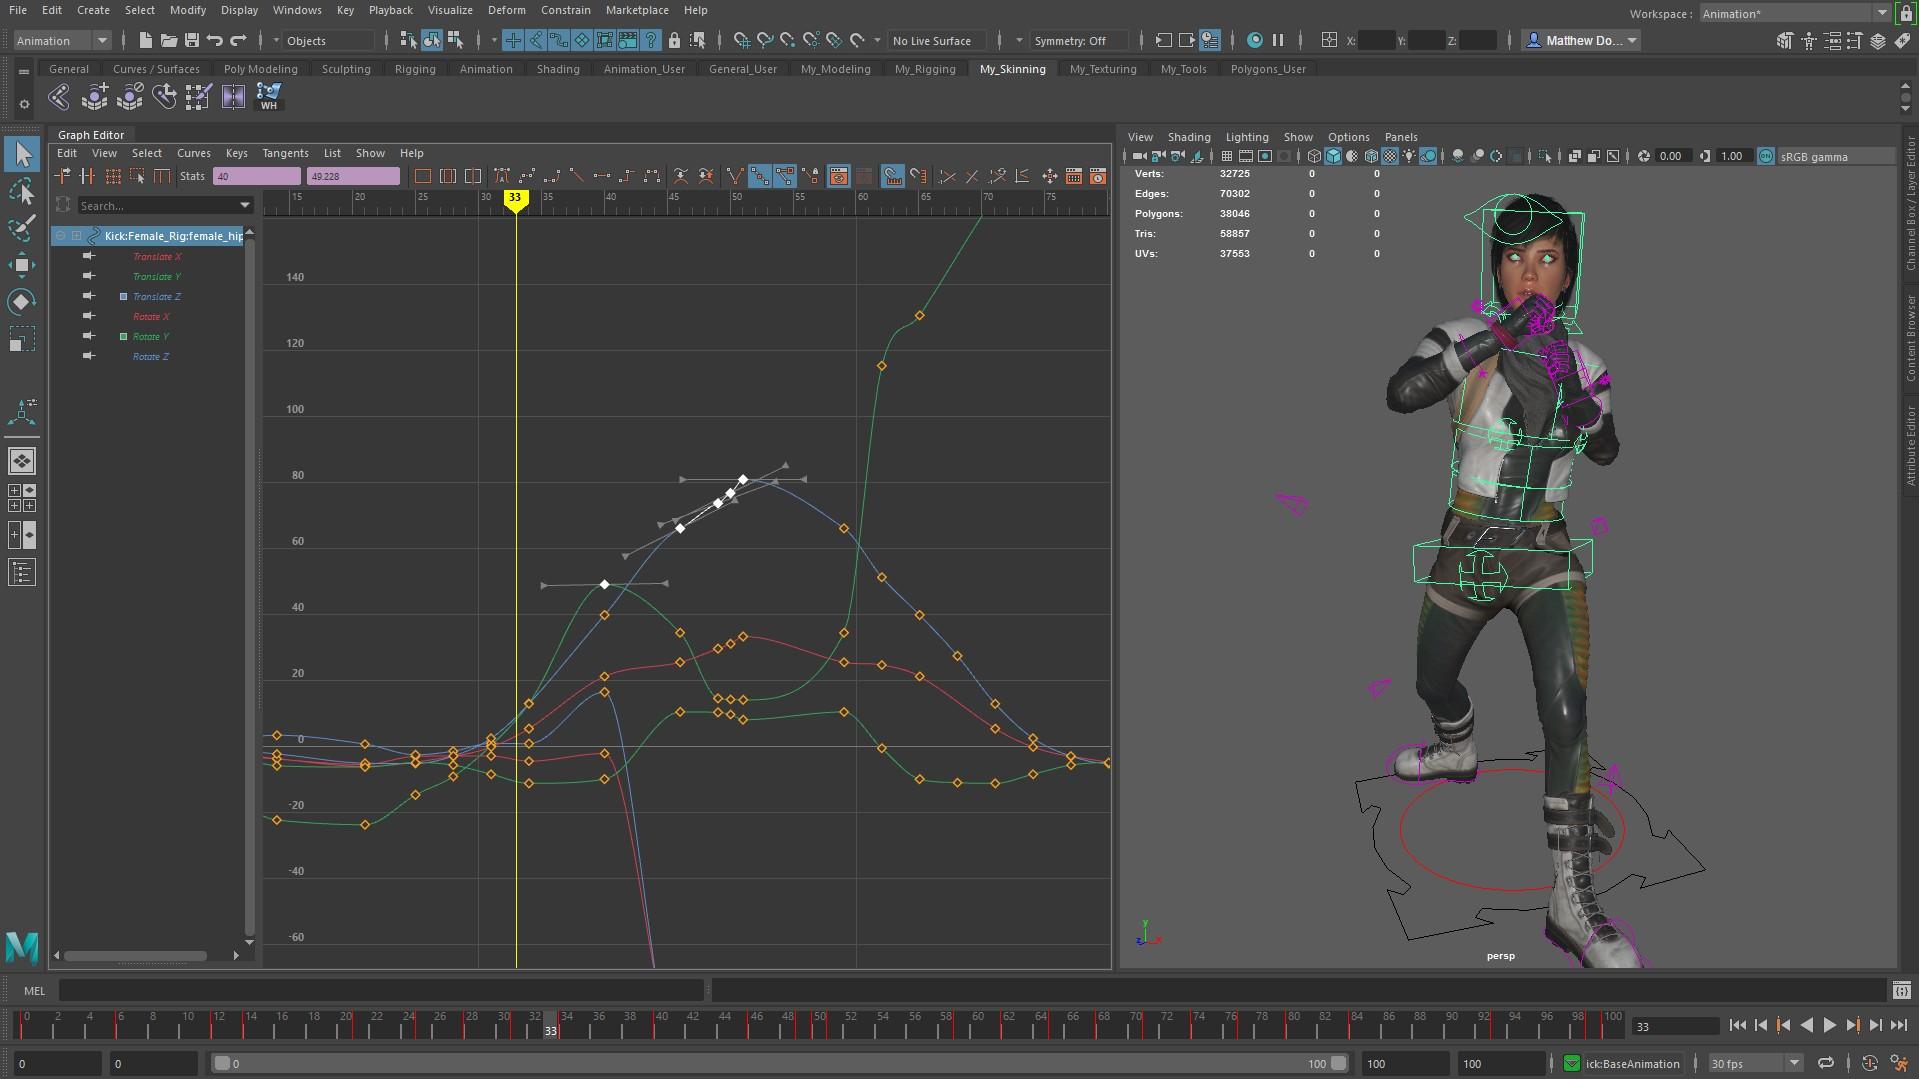 Maya LT GraphEditor_ModernUI_1920x1080